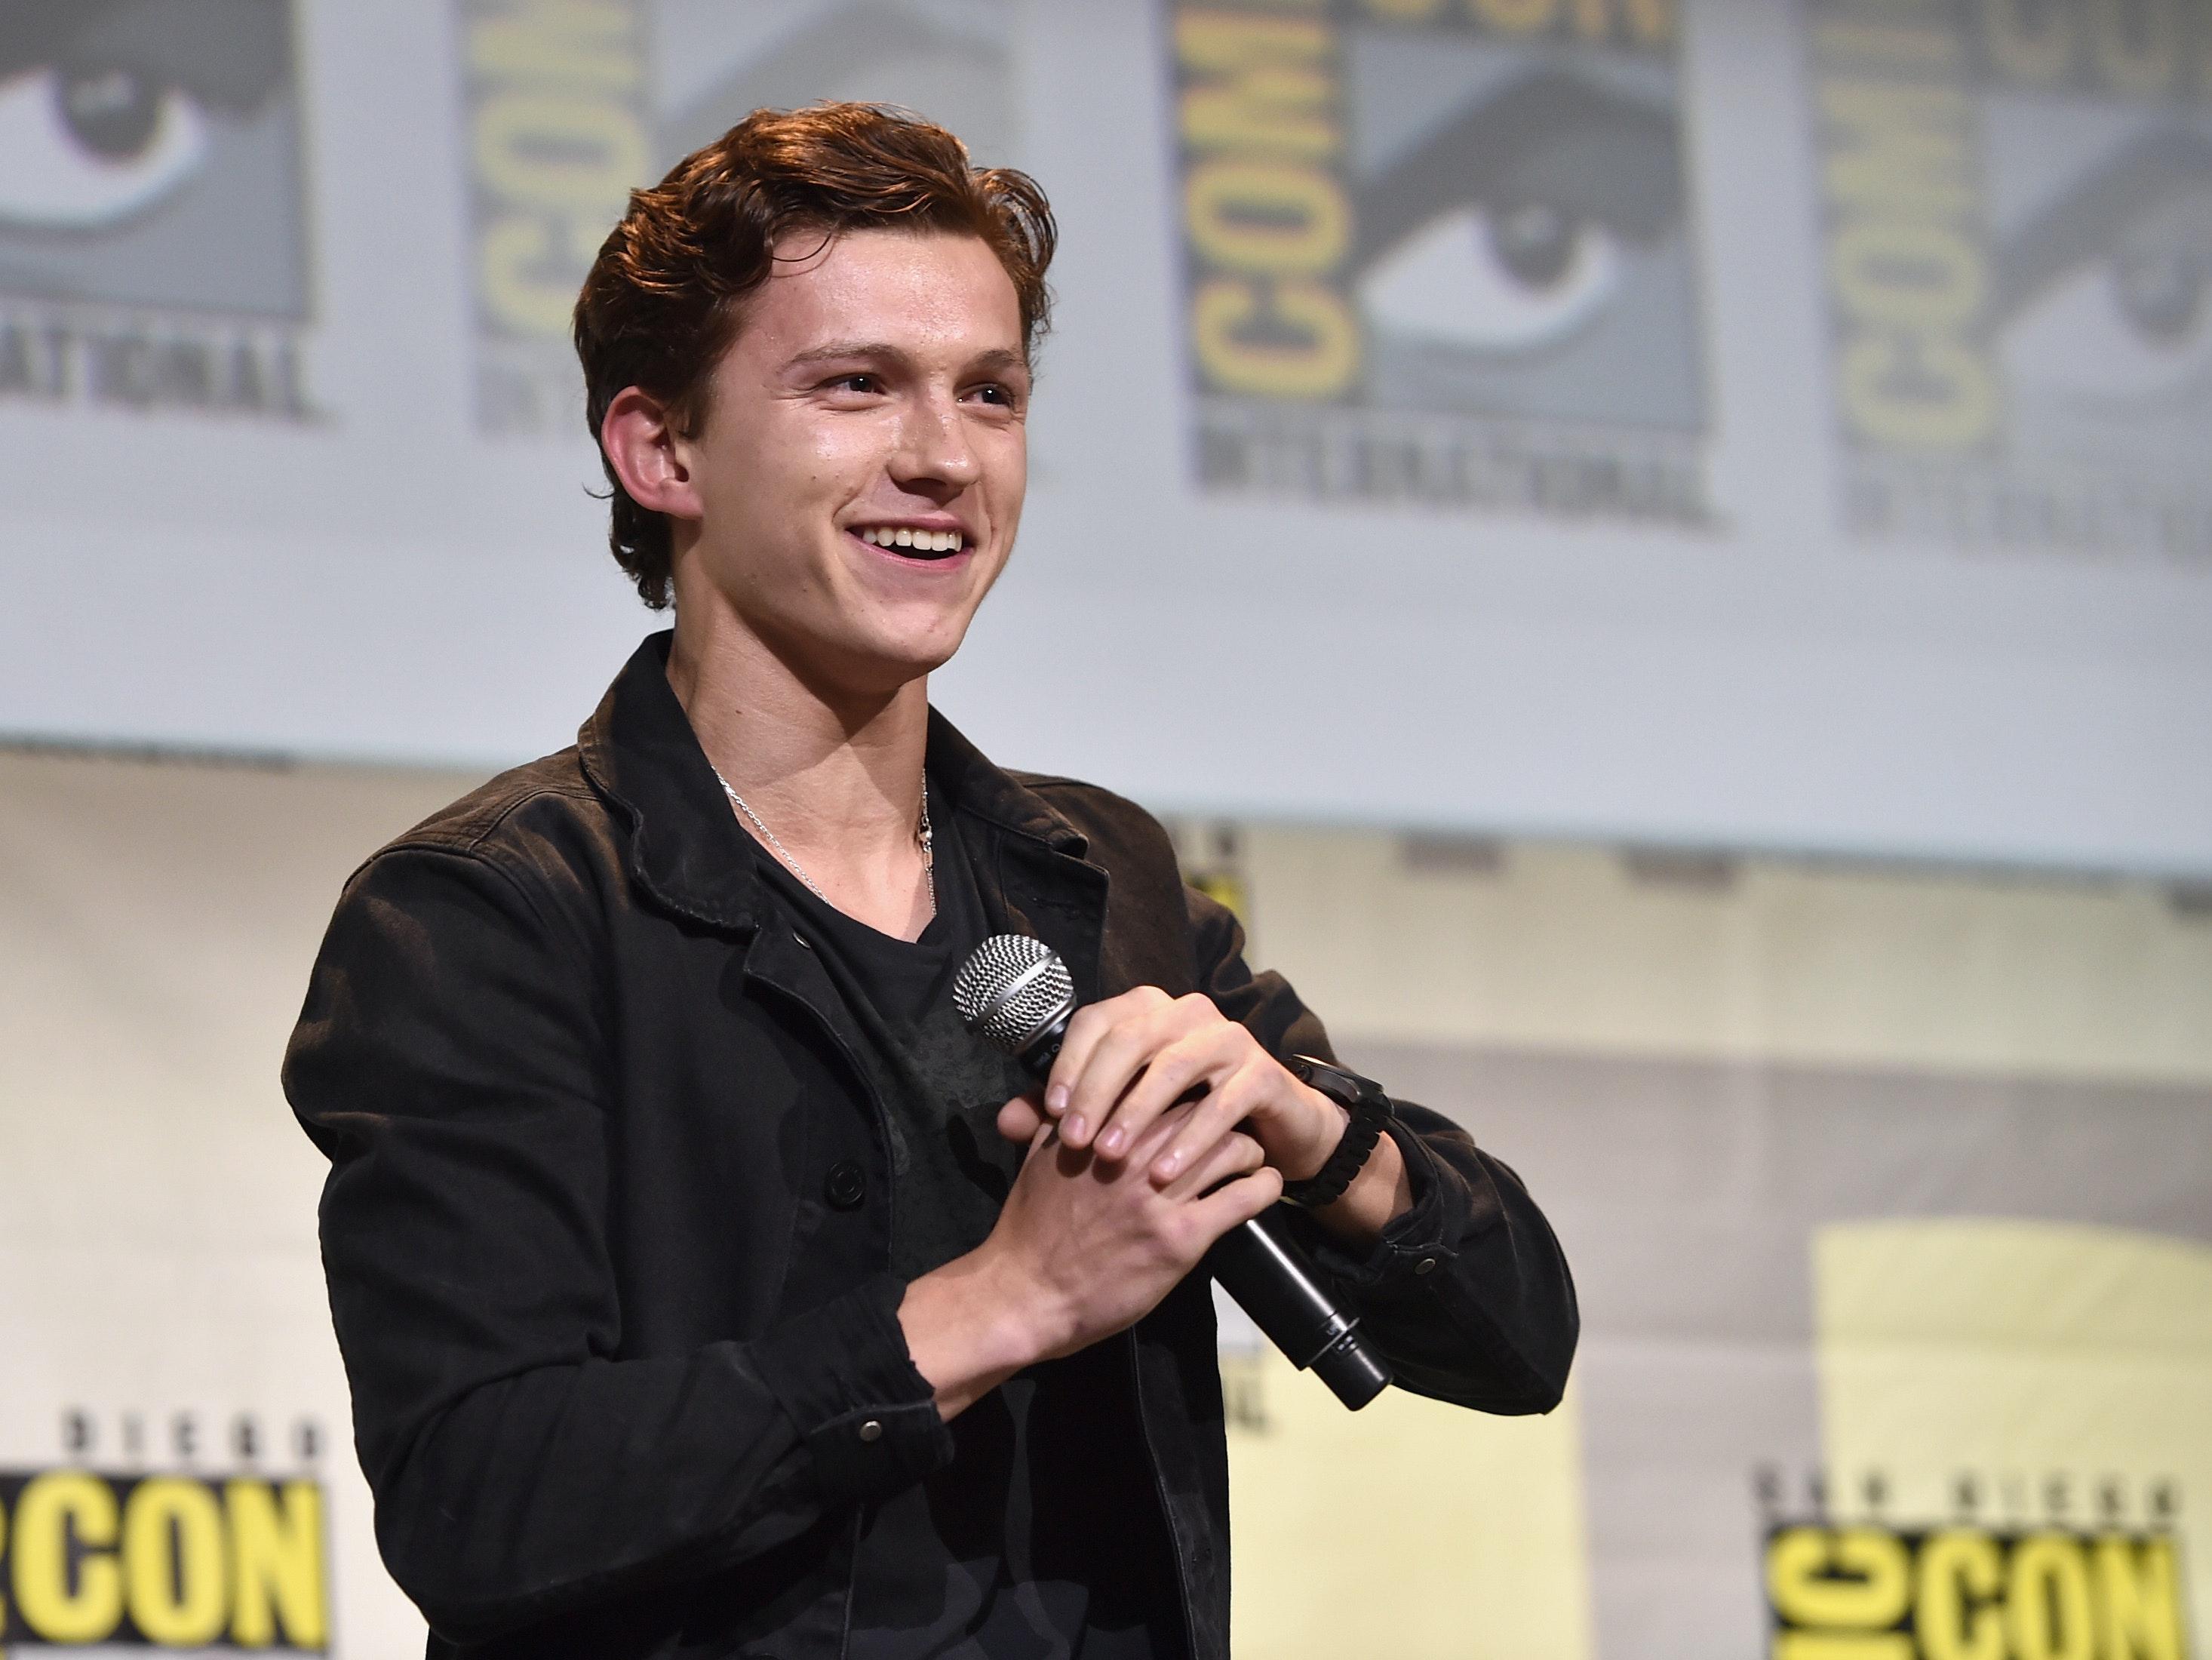 Let Tom Holland's 'Spider-Man' Stunts Make You Feel Flabby, Old